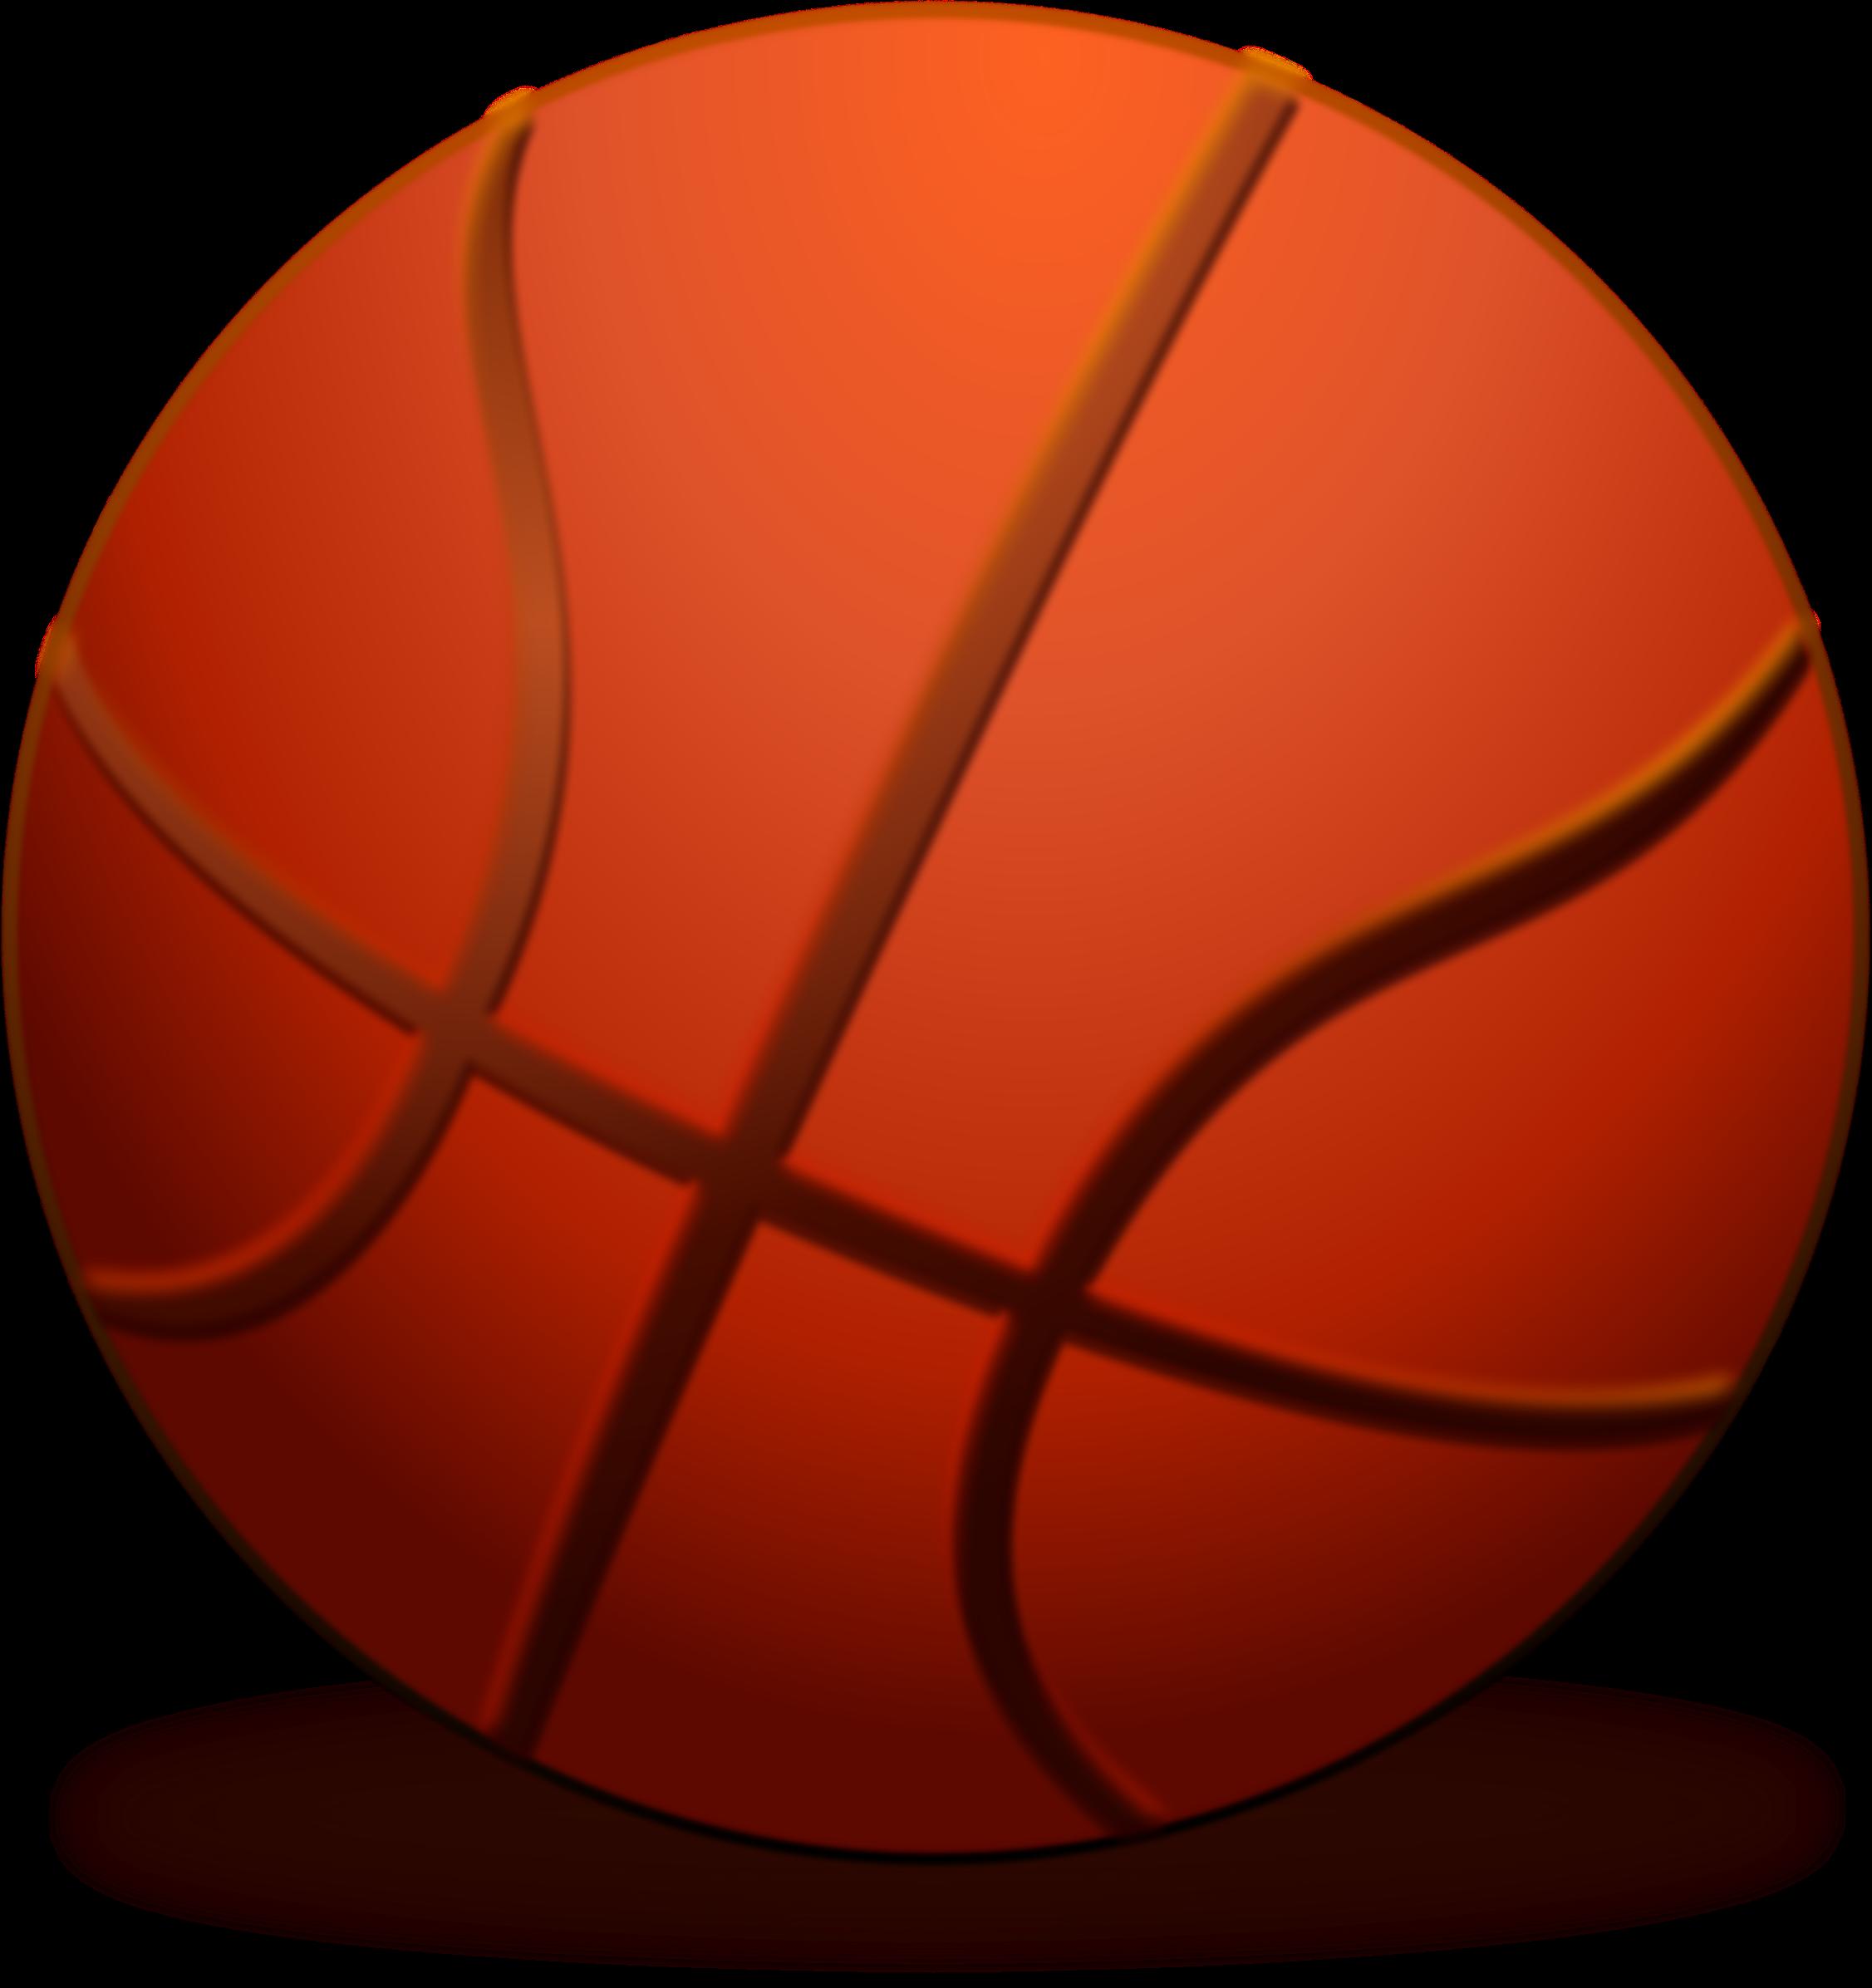 png royalty free Basketball clip pdf. Clipart ball big image